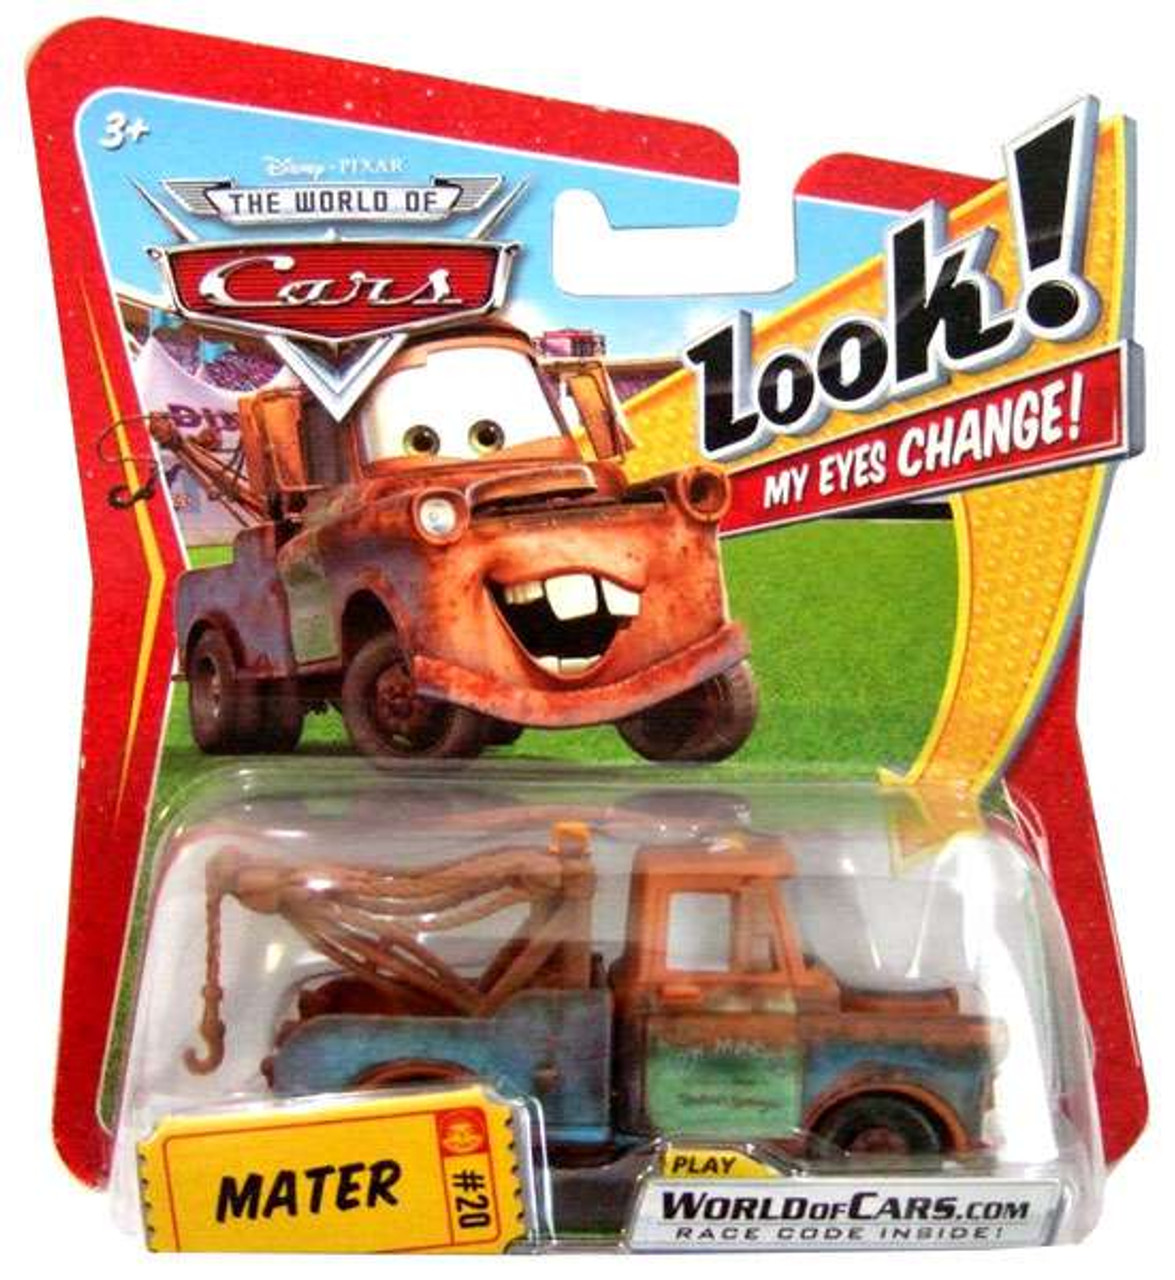 Disney Cars The World of Cars Lenticular Eyes Series 1 Mater Diecast Car